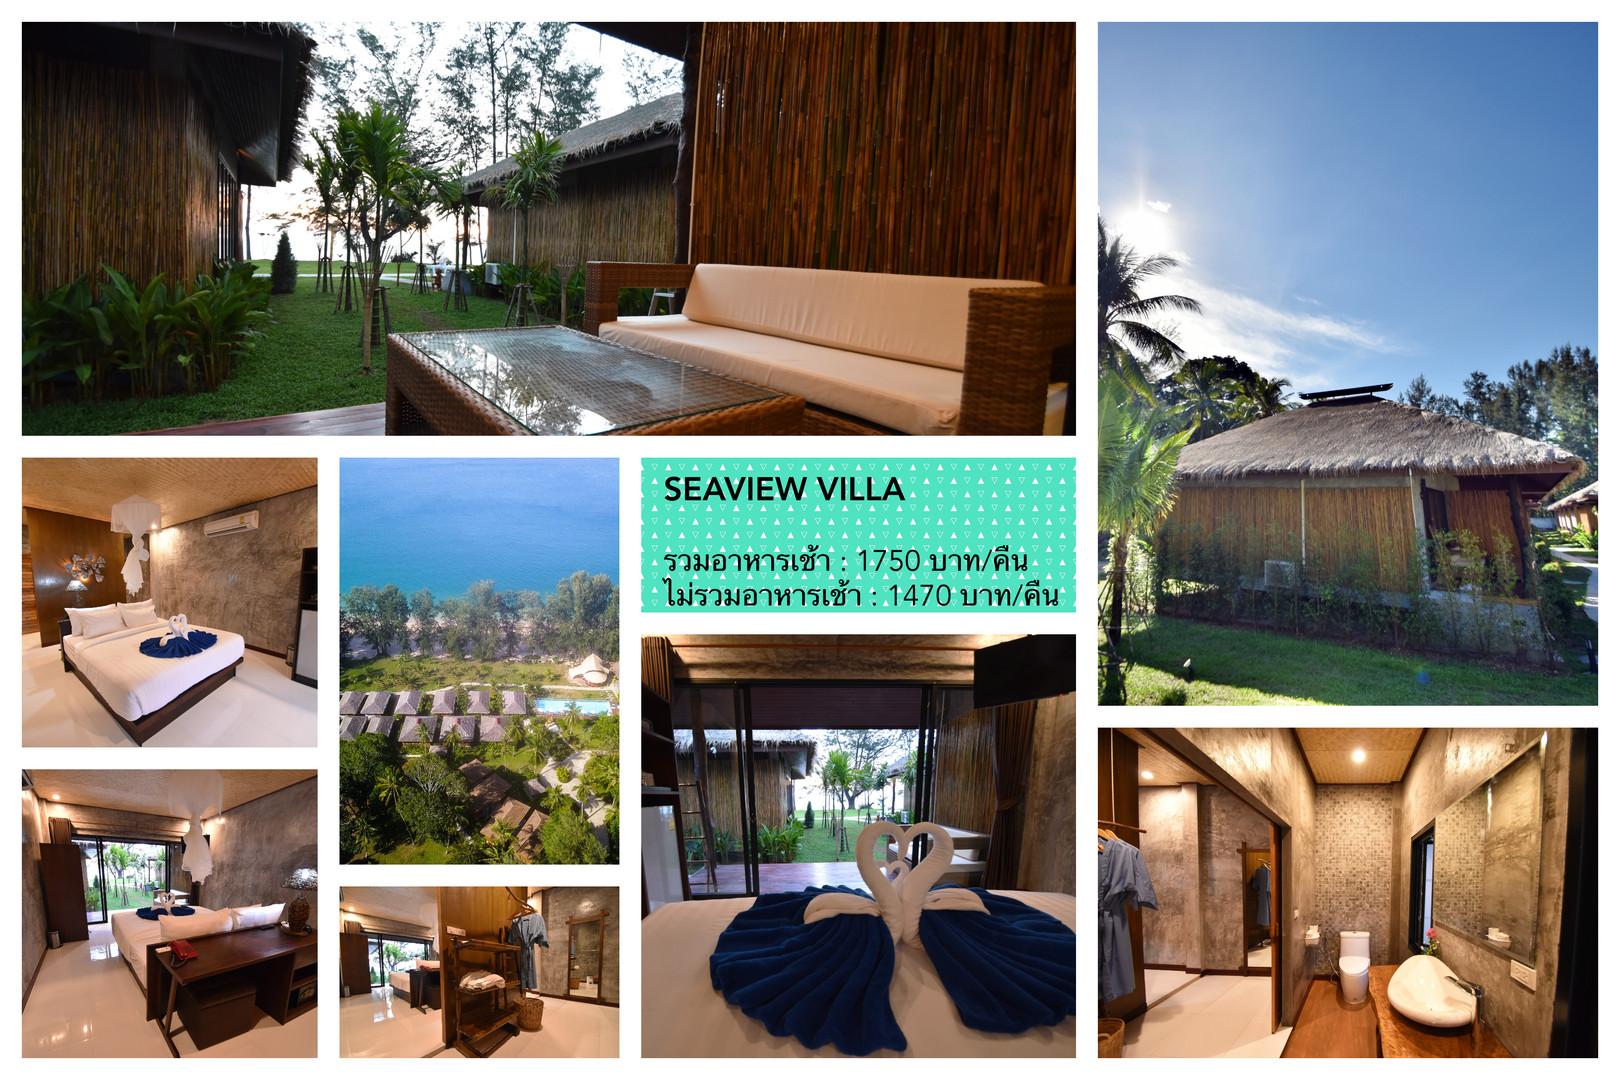 seaview villa.jpg